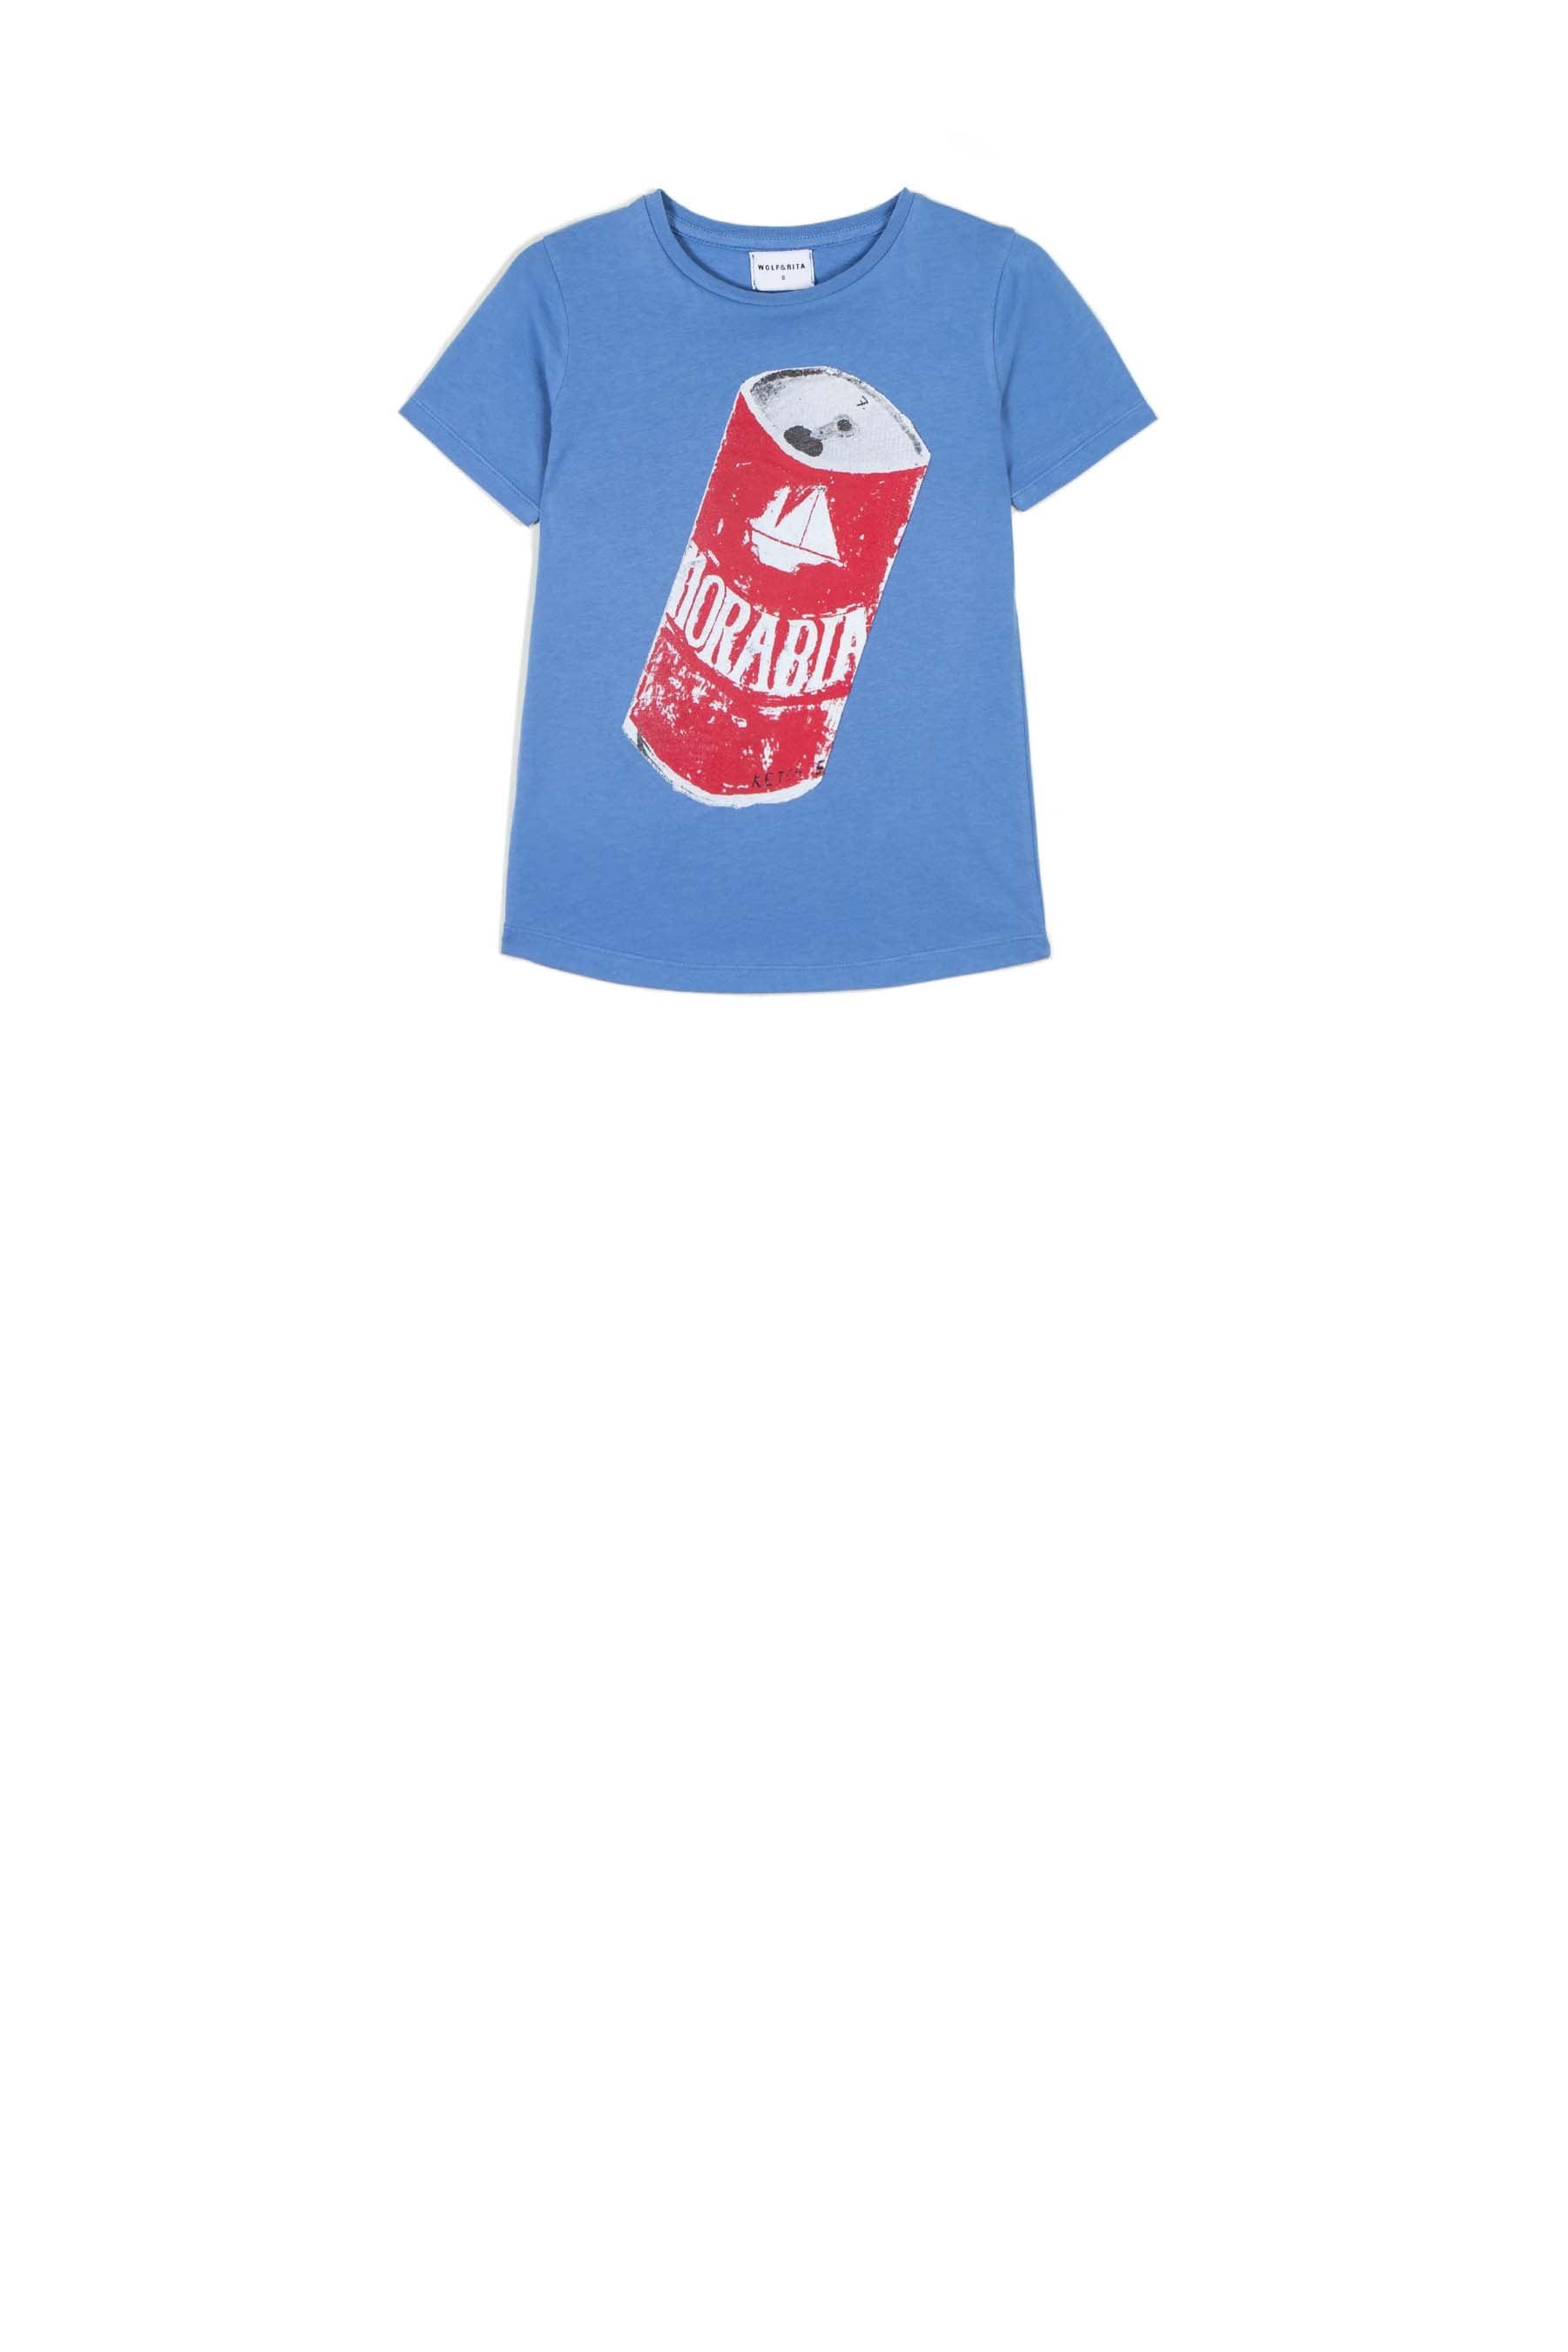 wolf rita sebastiao t-shirt soda